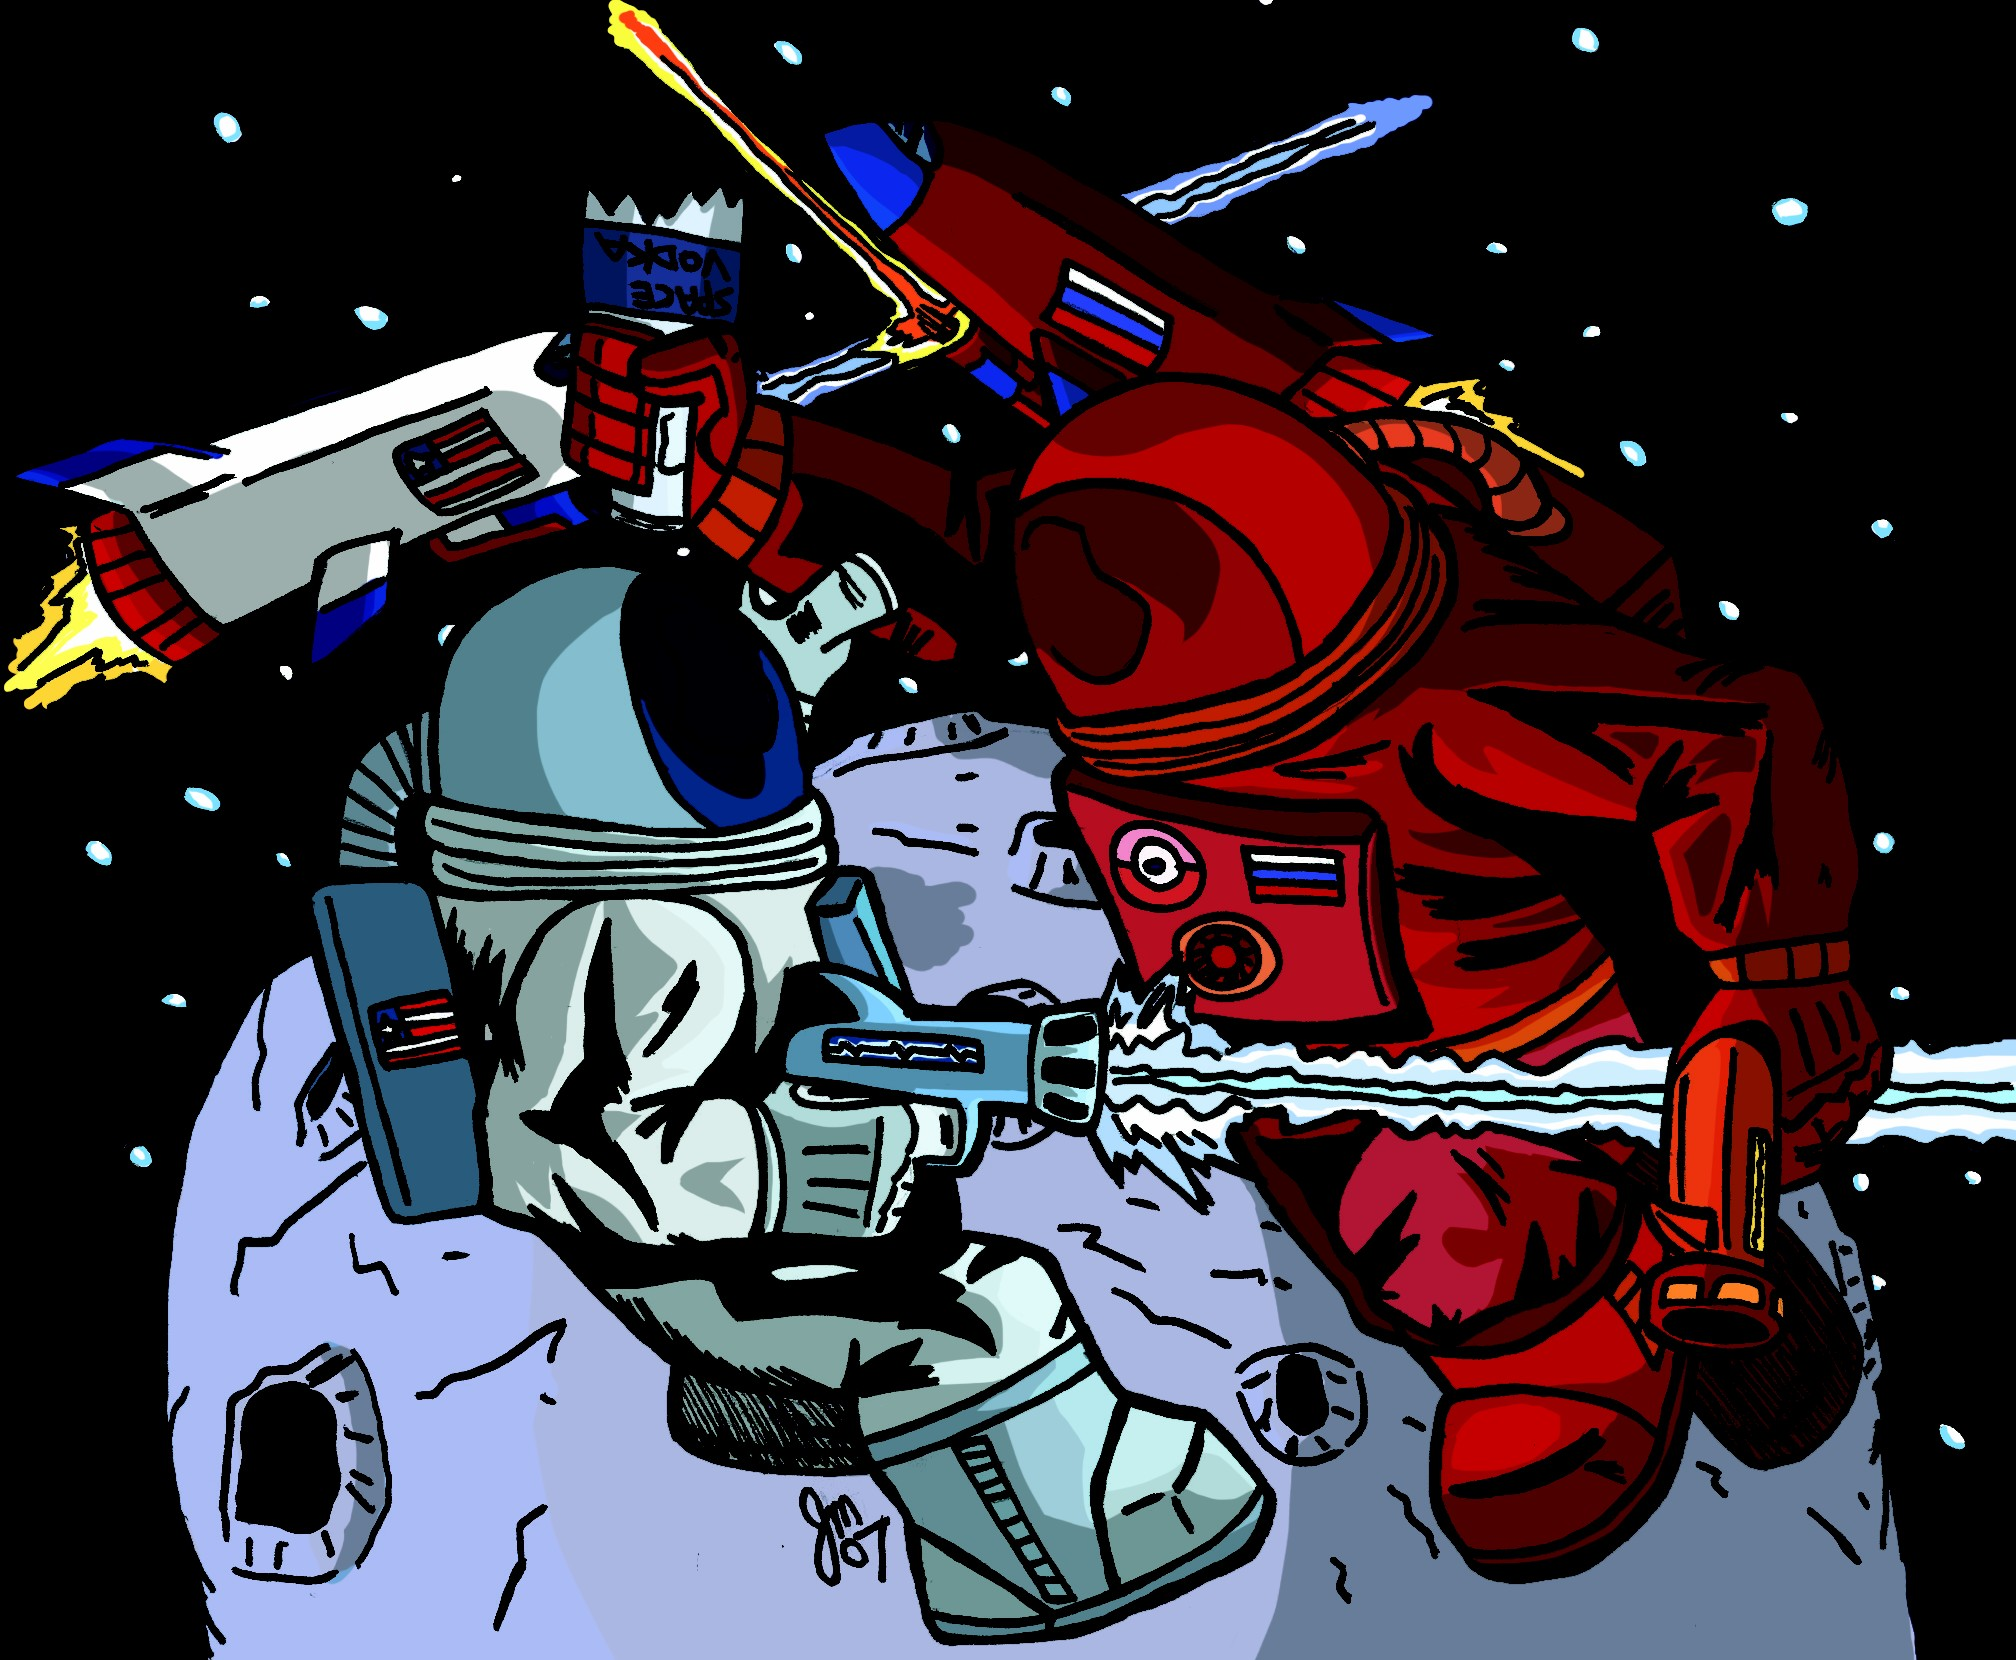 Astronaut Fight